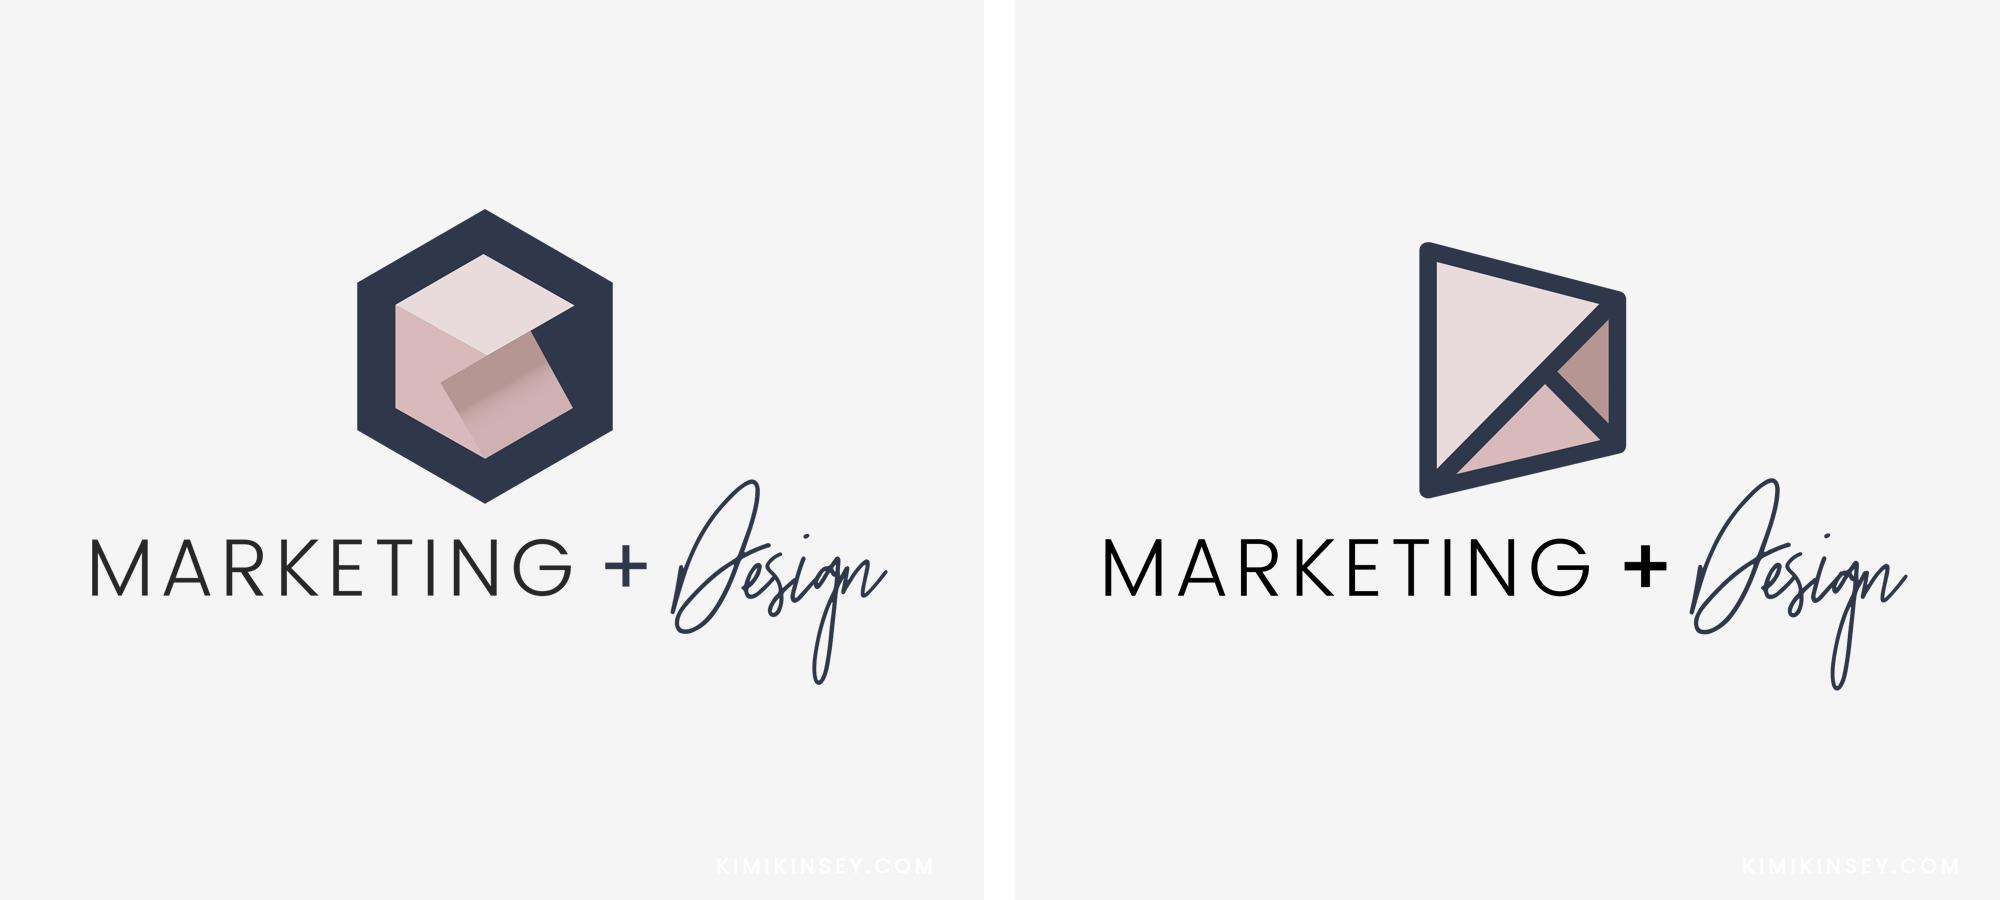 Kimi Kinsey Logo Comparison